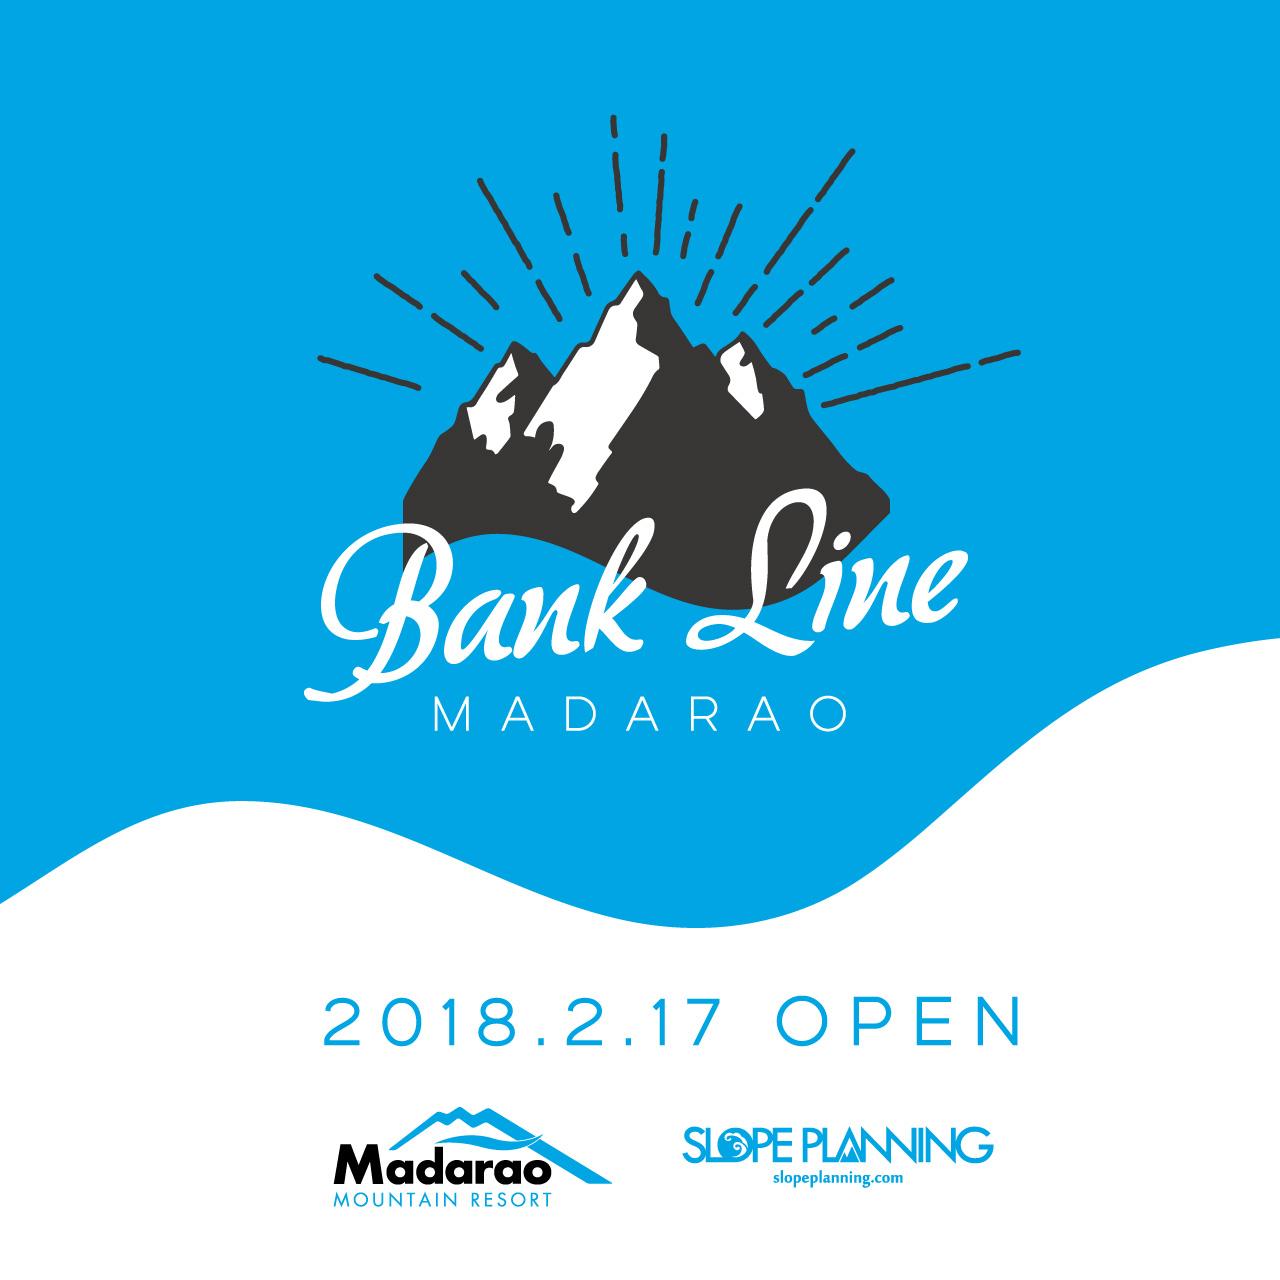 bankline_madarao_2018